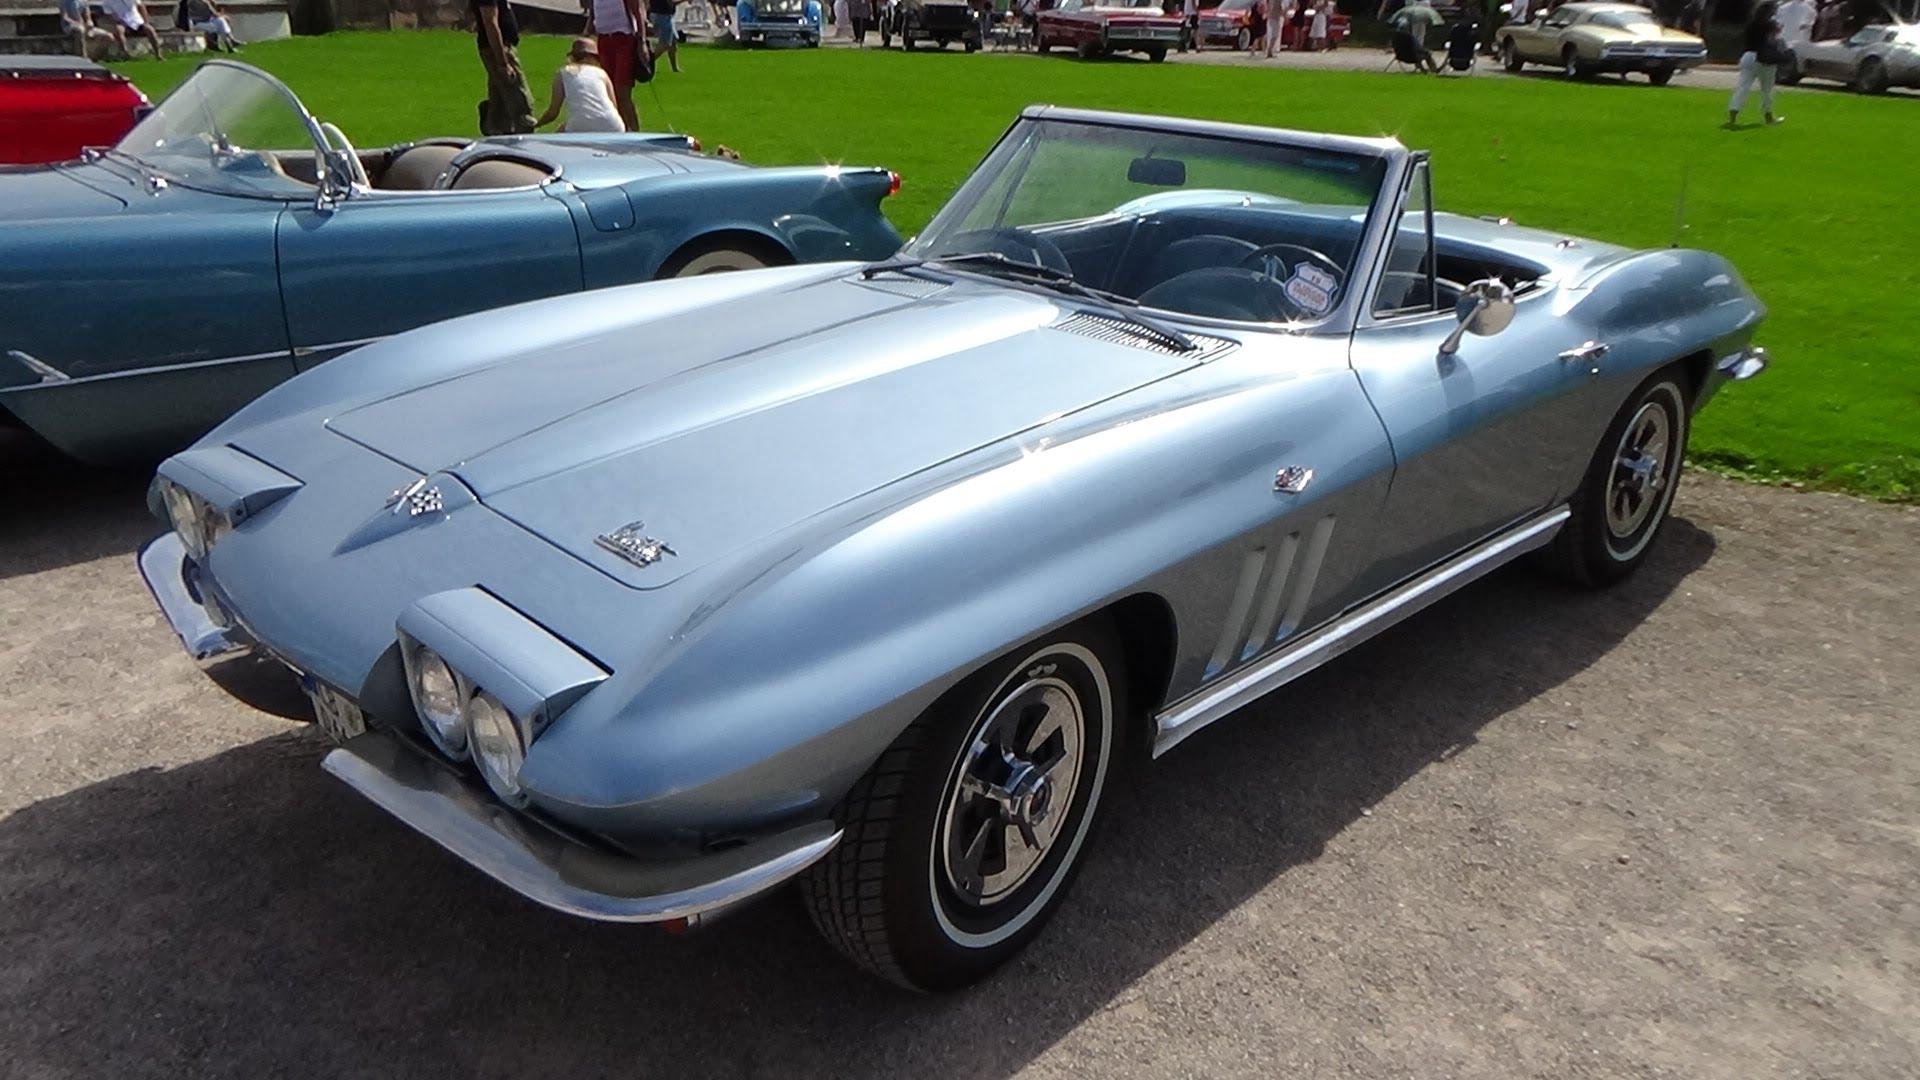 Chevrolet Corvette C2 1962 - 1967 Coupe #8